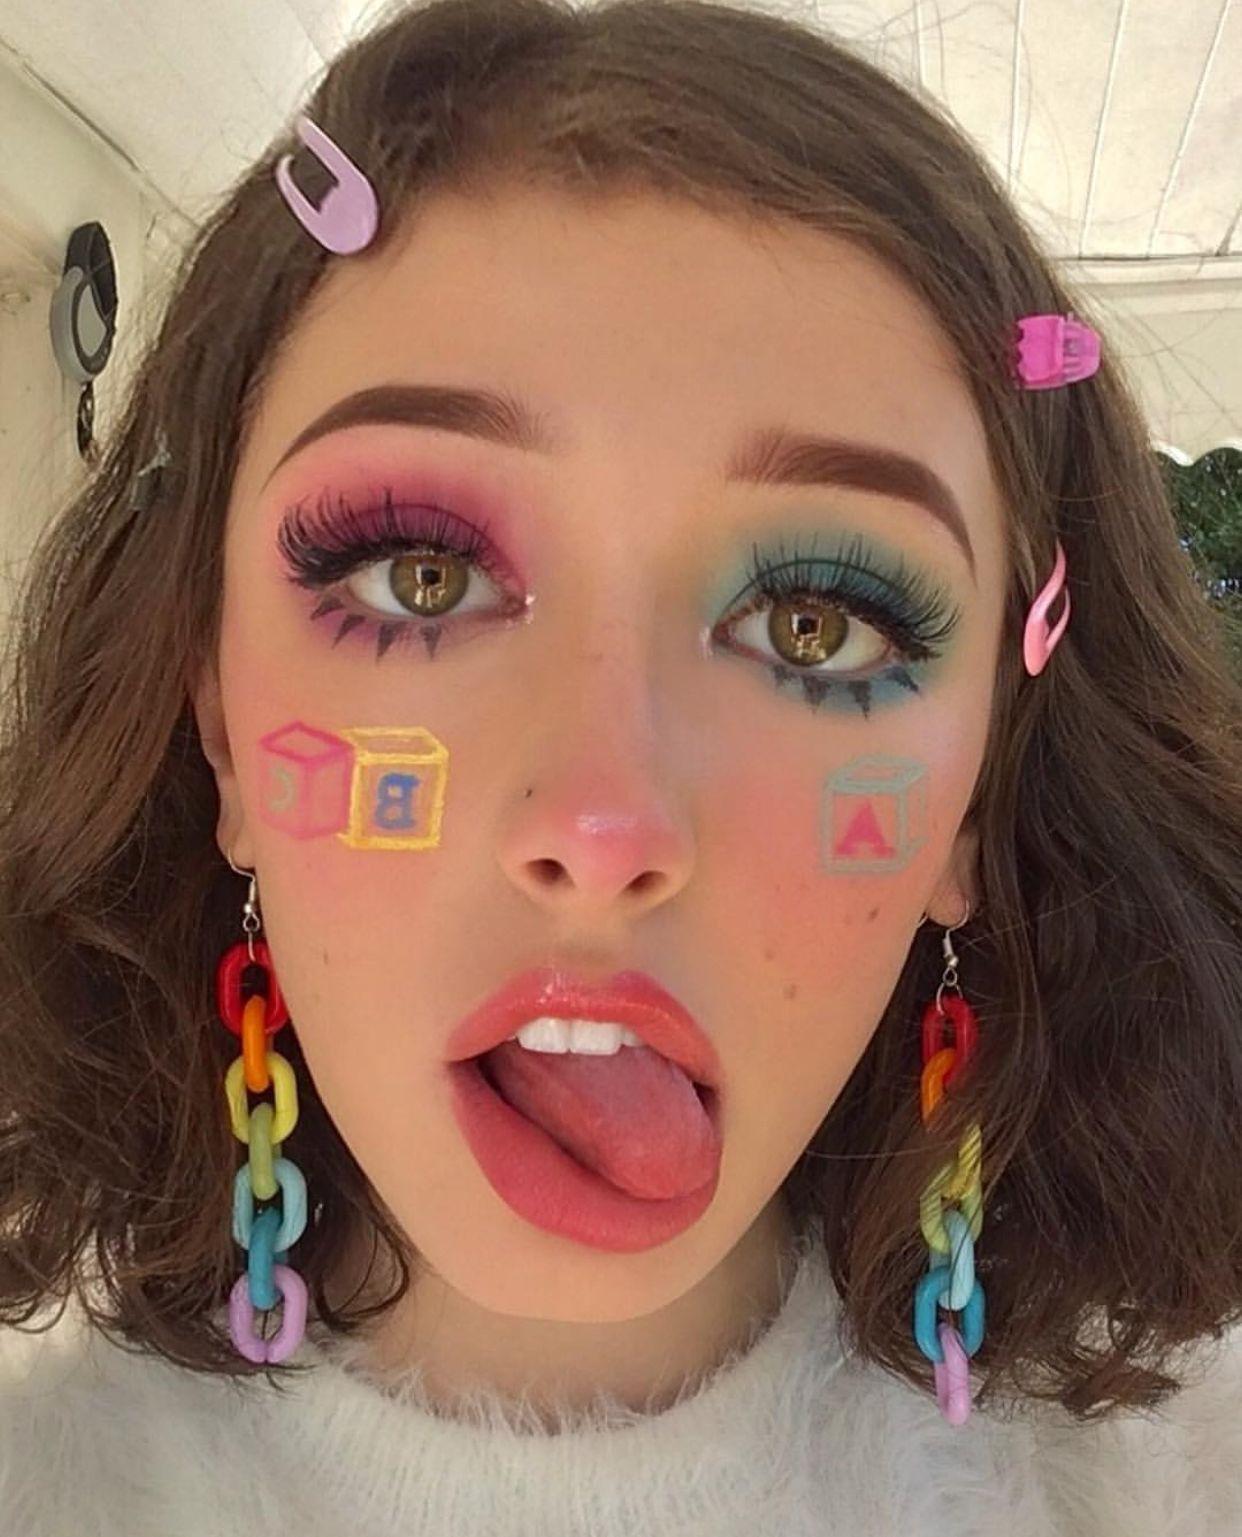 Punk Girl Goth Gothic Aesthetic Cute Pretty Beautiful Beauty Alternative Grunge Eyemakeupdaytime In 2020 Aesthetic Makeup Makeup Inspiration Crazy Makeup